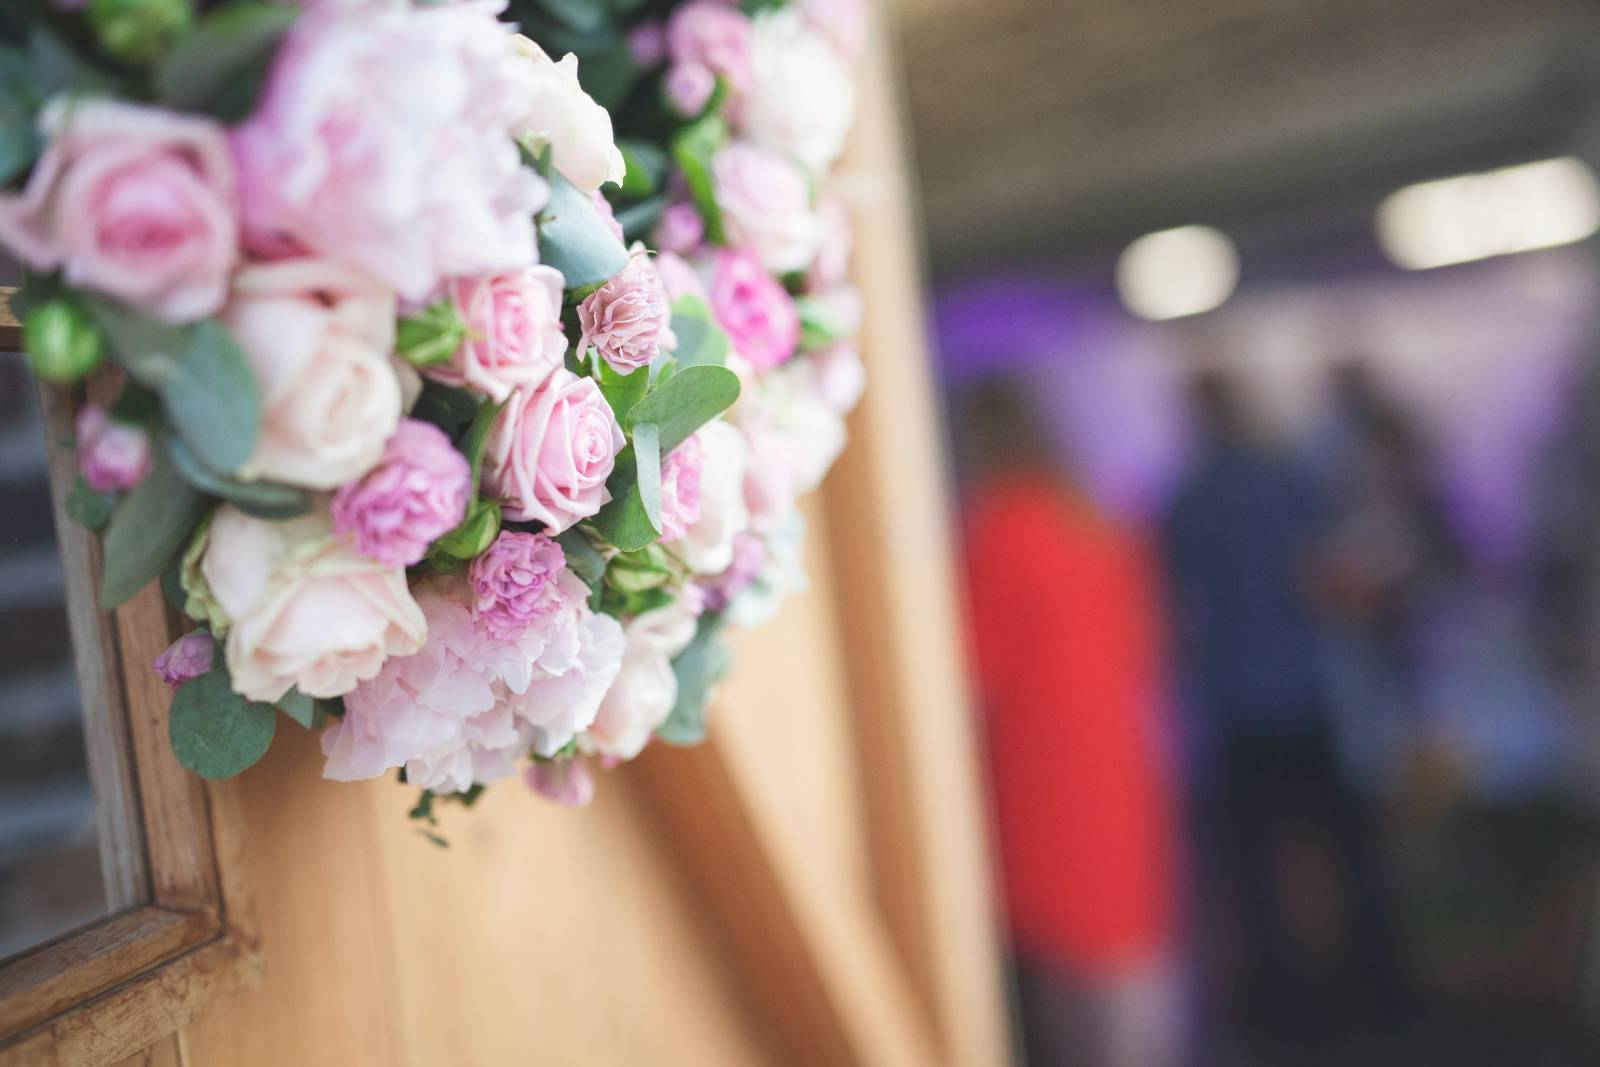 Carpe Diem Bloemen & Decoratie - House of Weddings  - 36